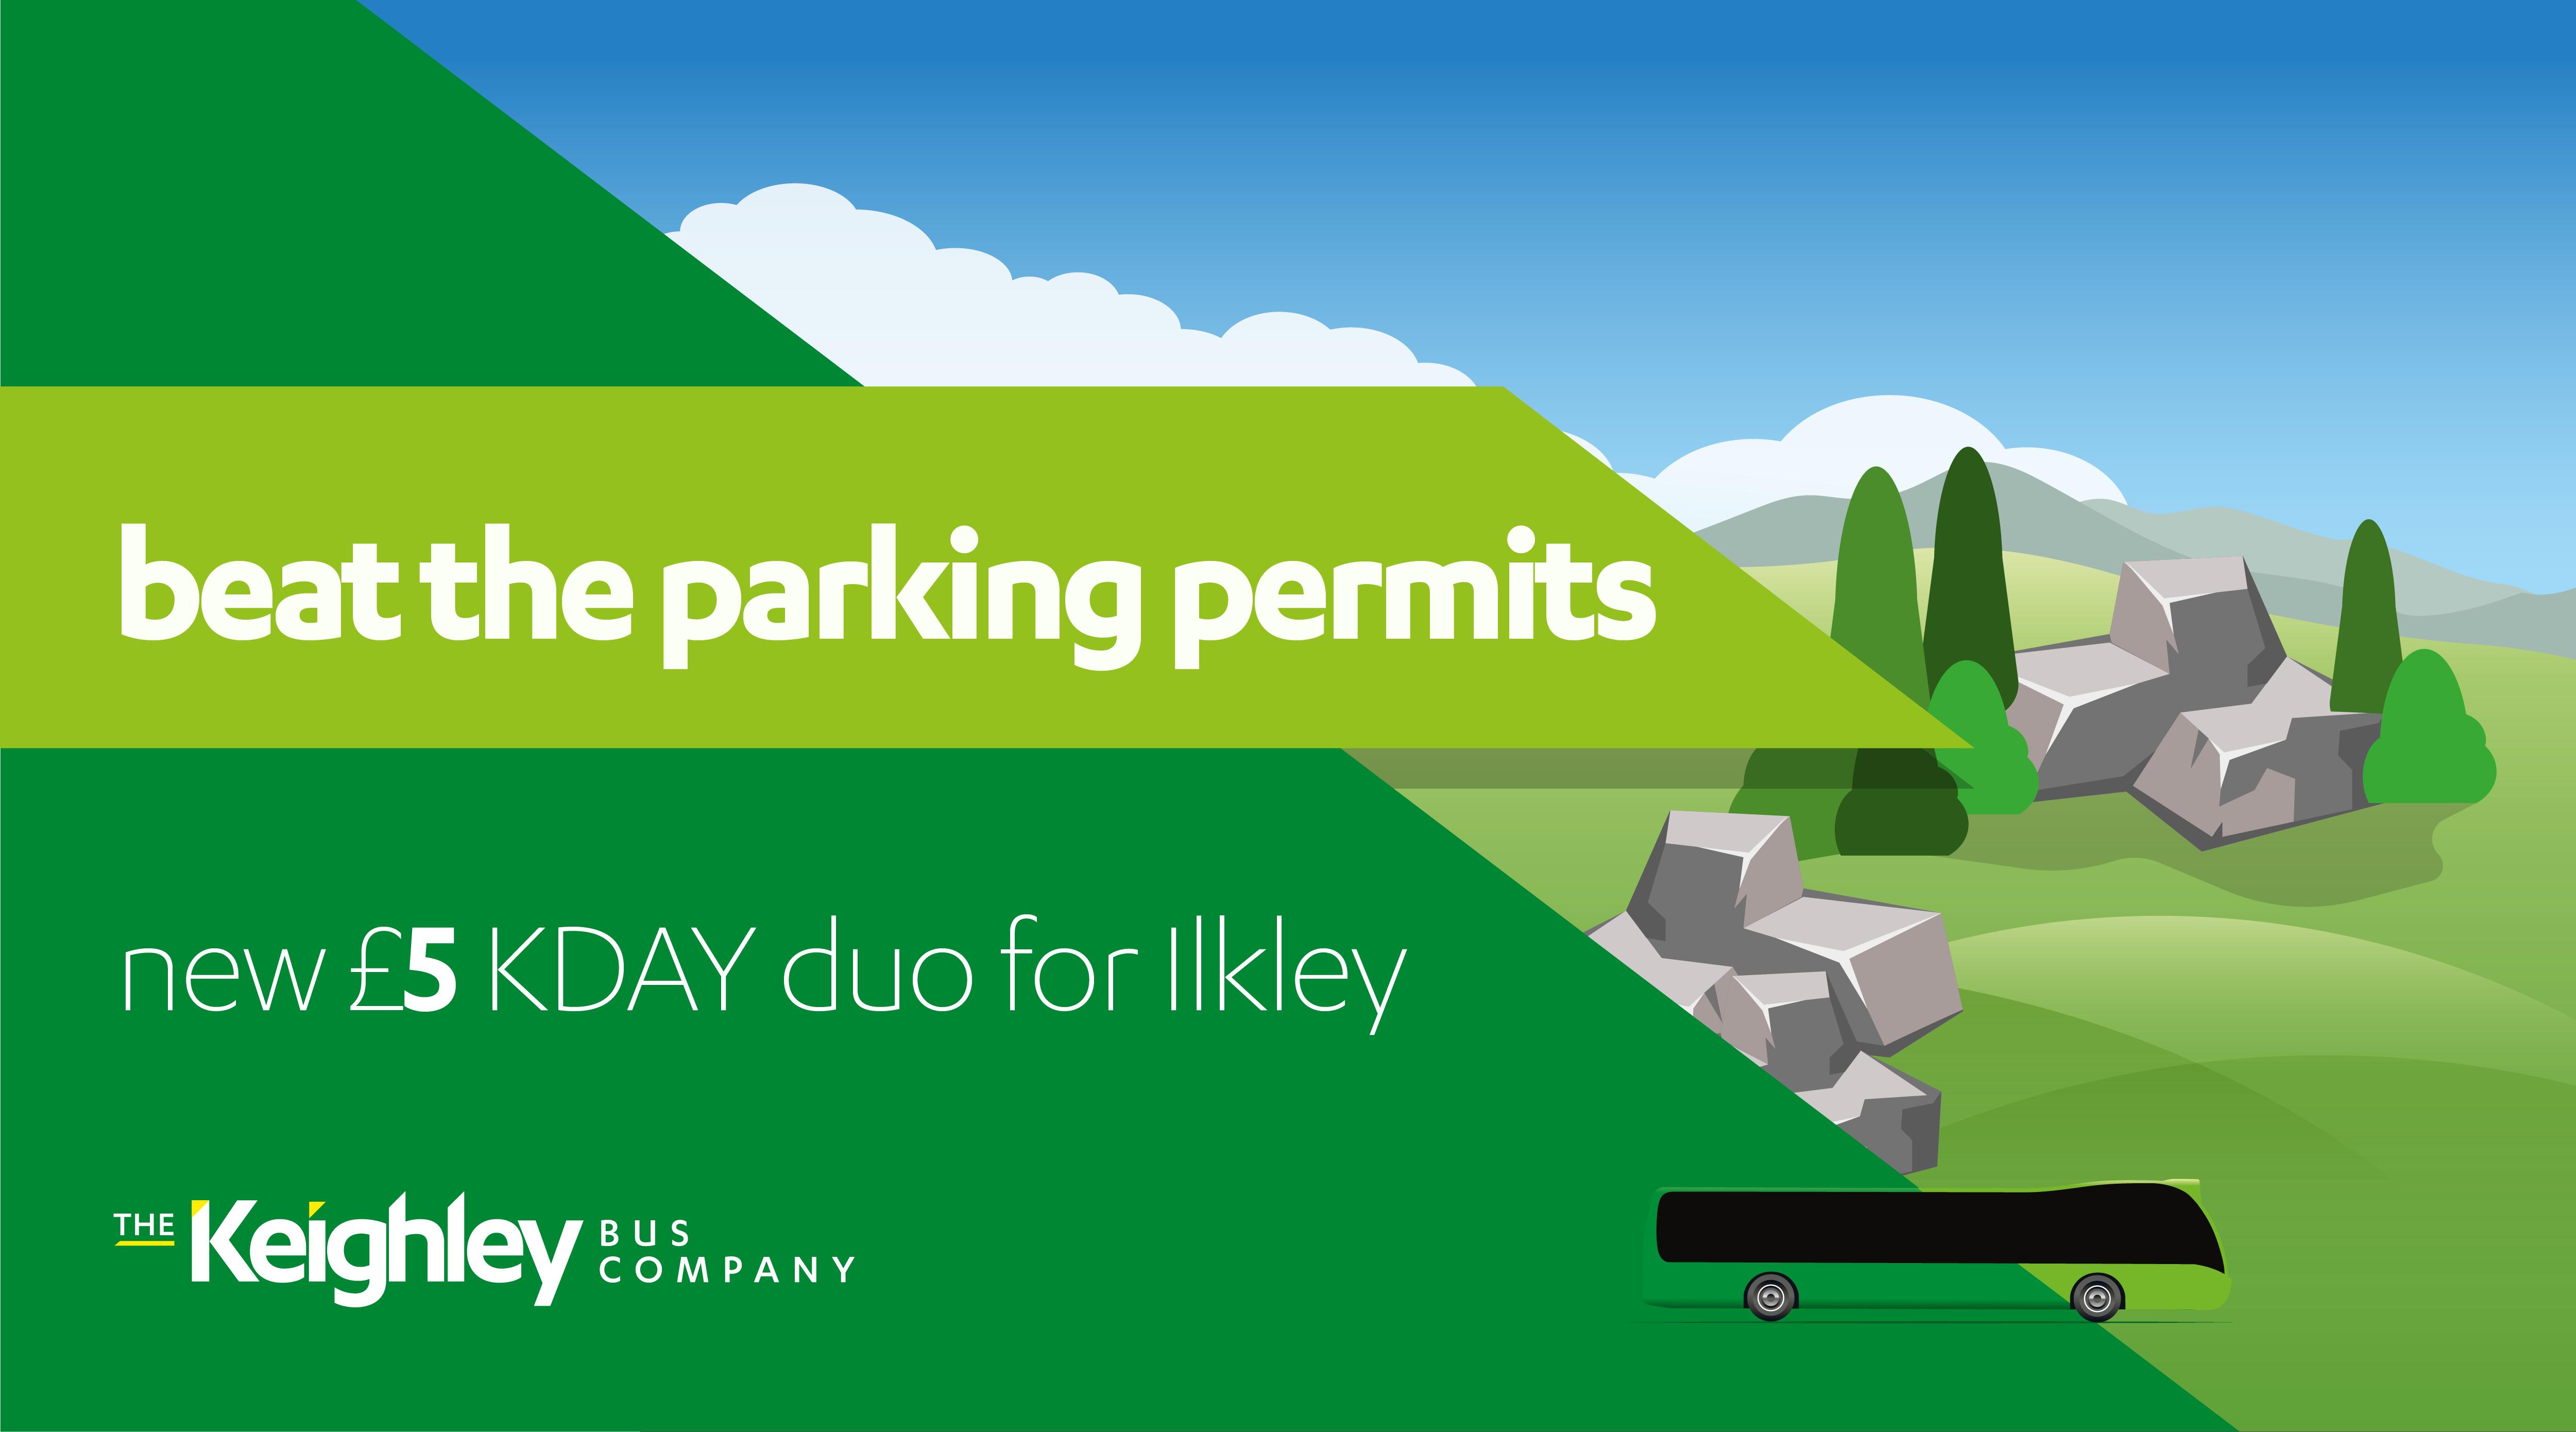 Ilkley parking permits